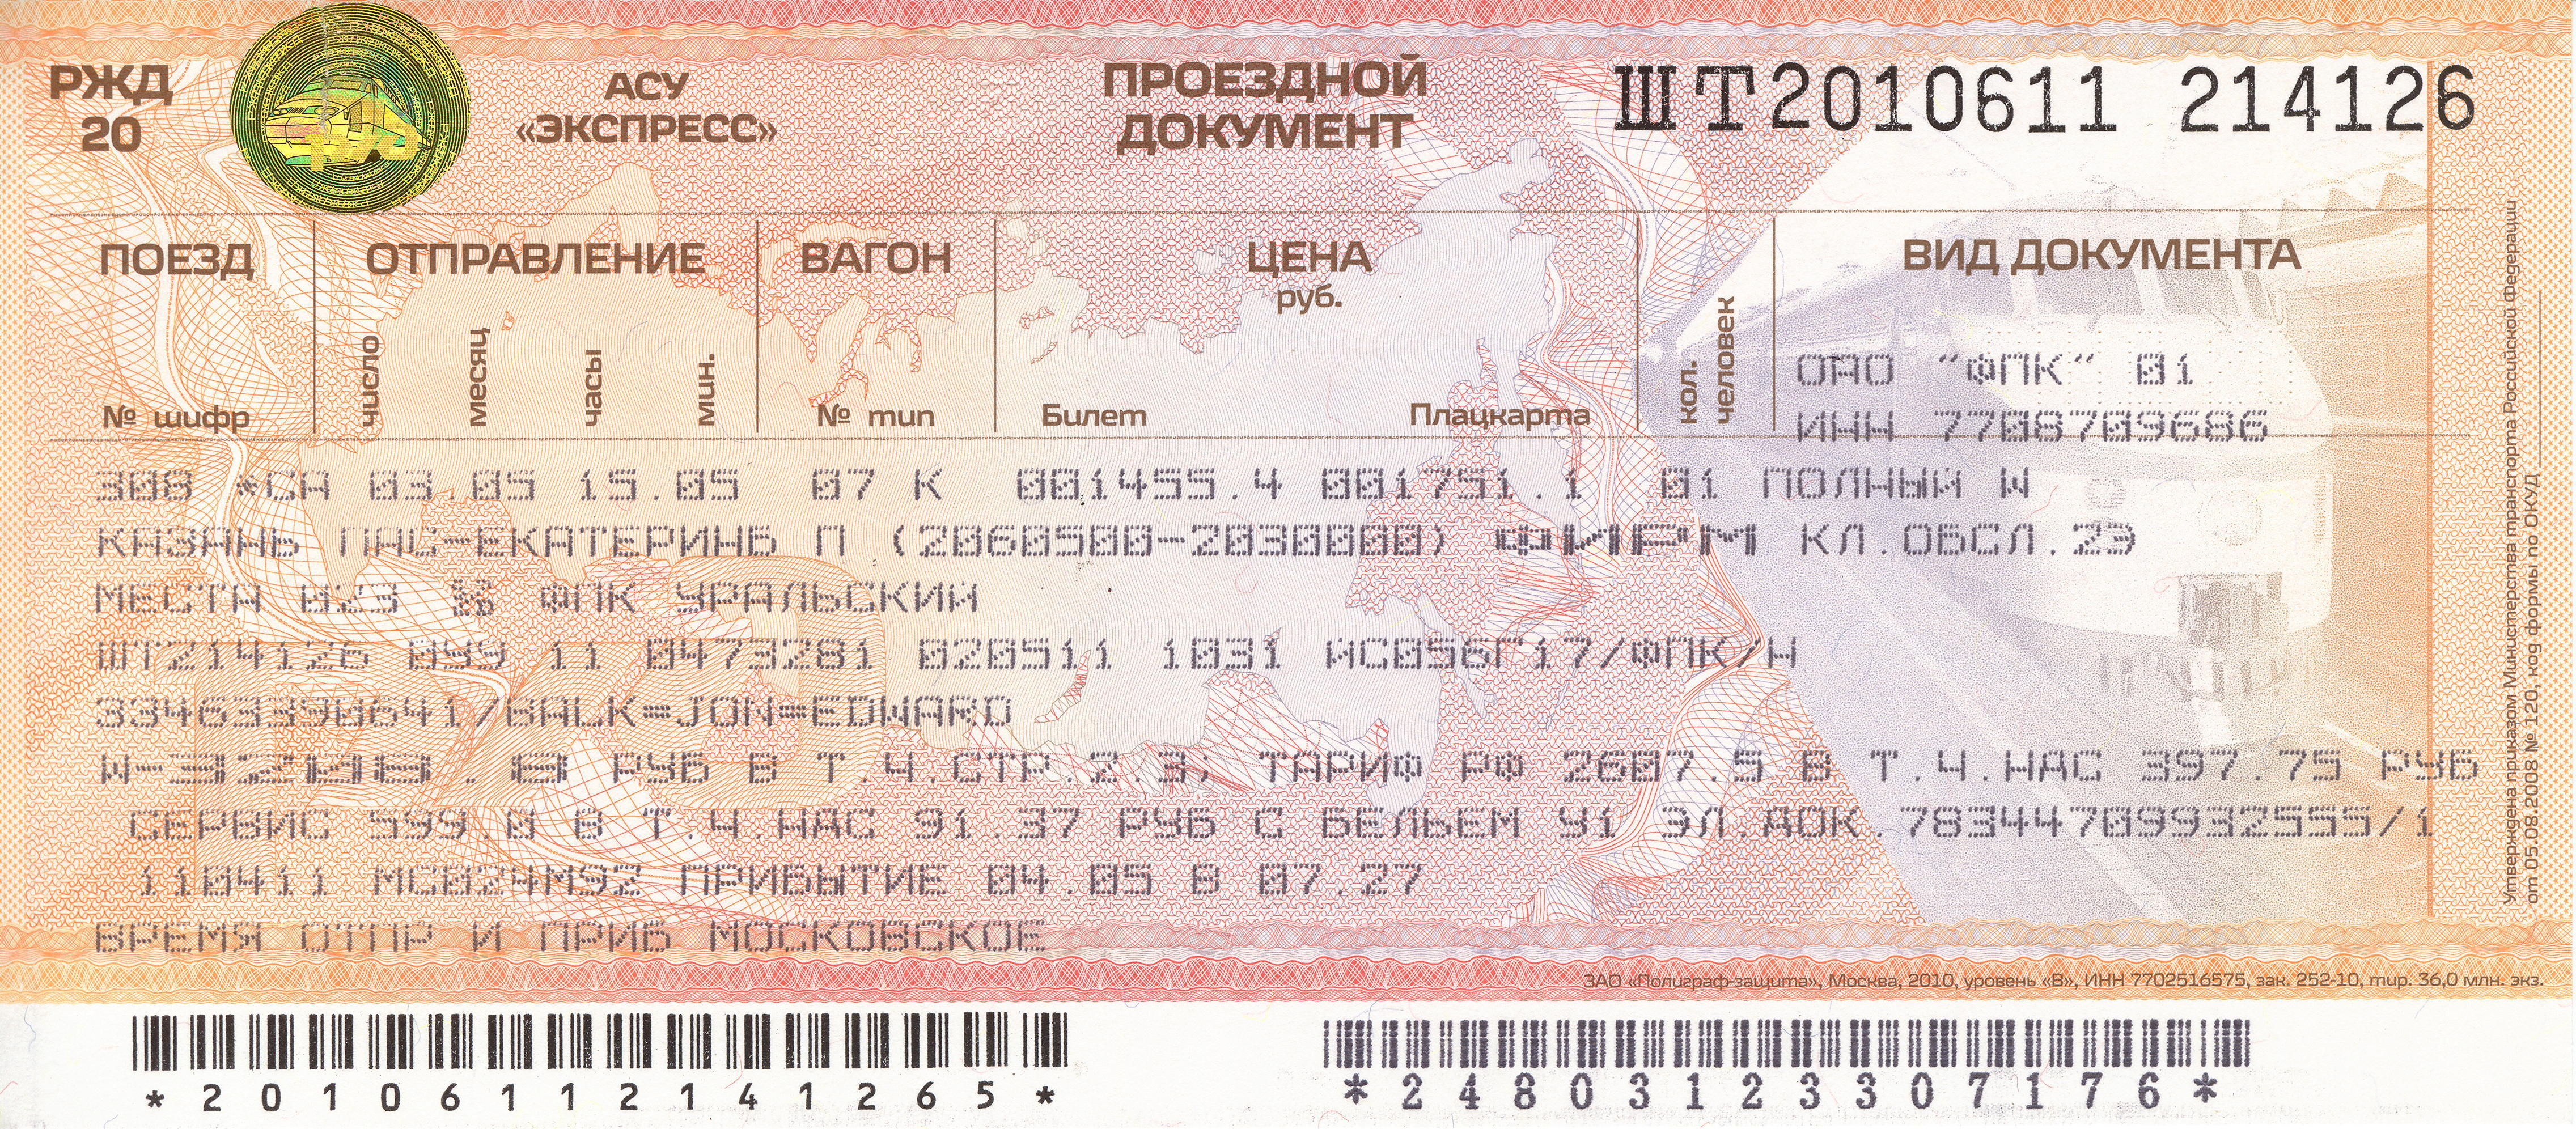 билеты жд архангельск: